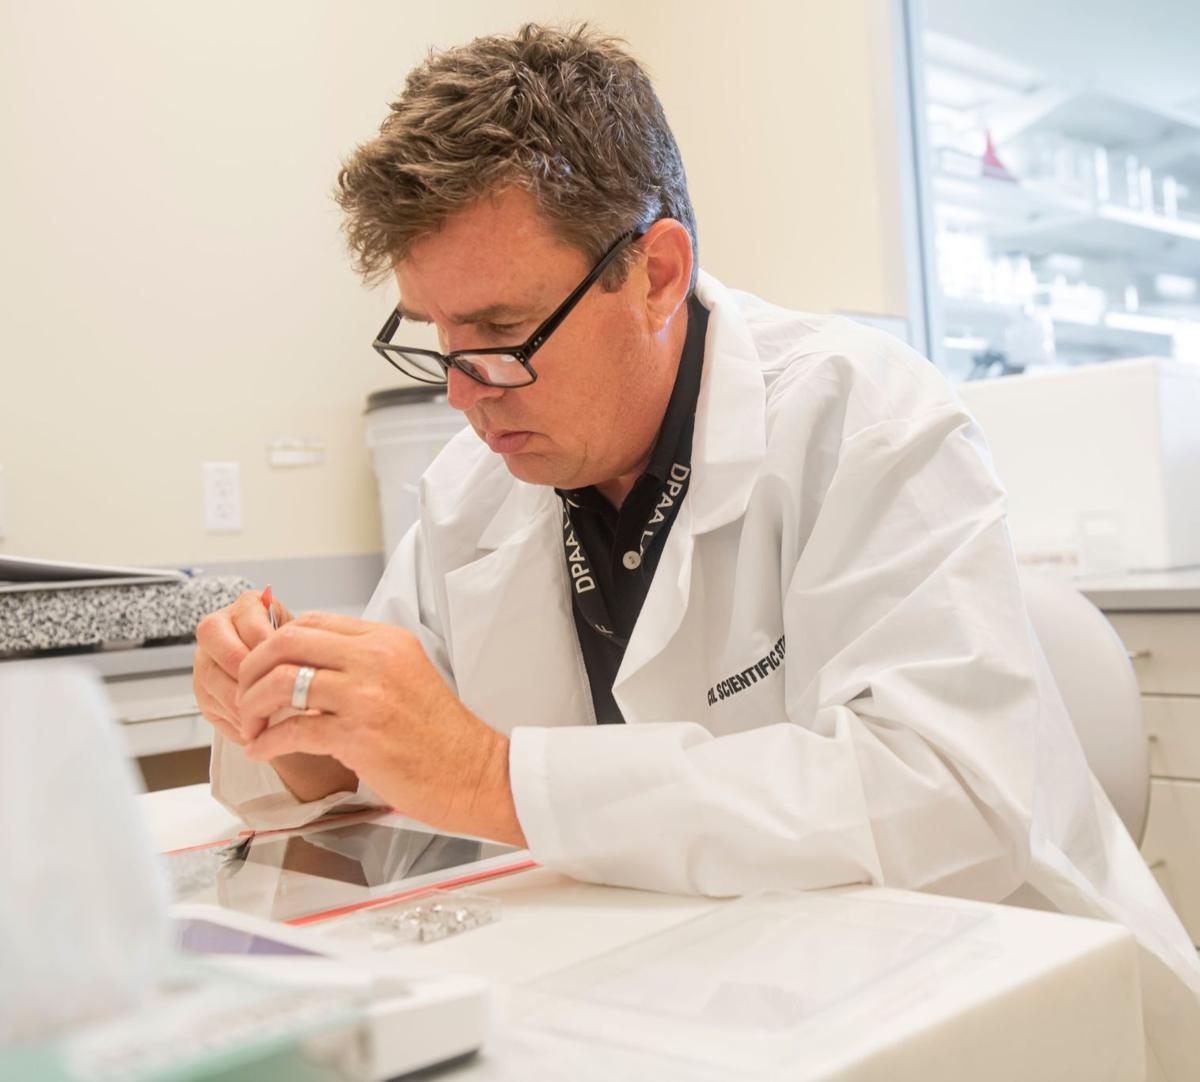 Dr. Gregory Berg